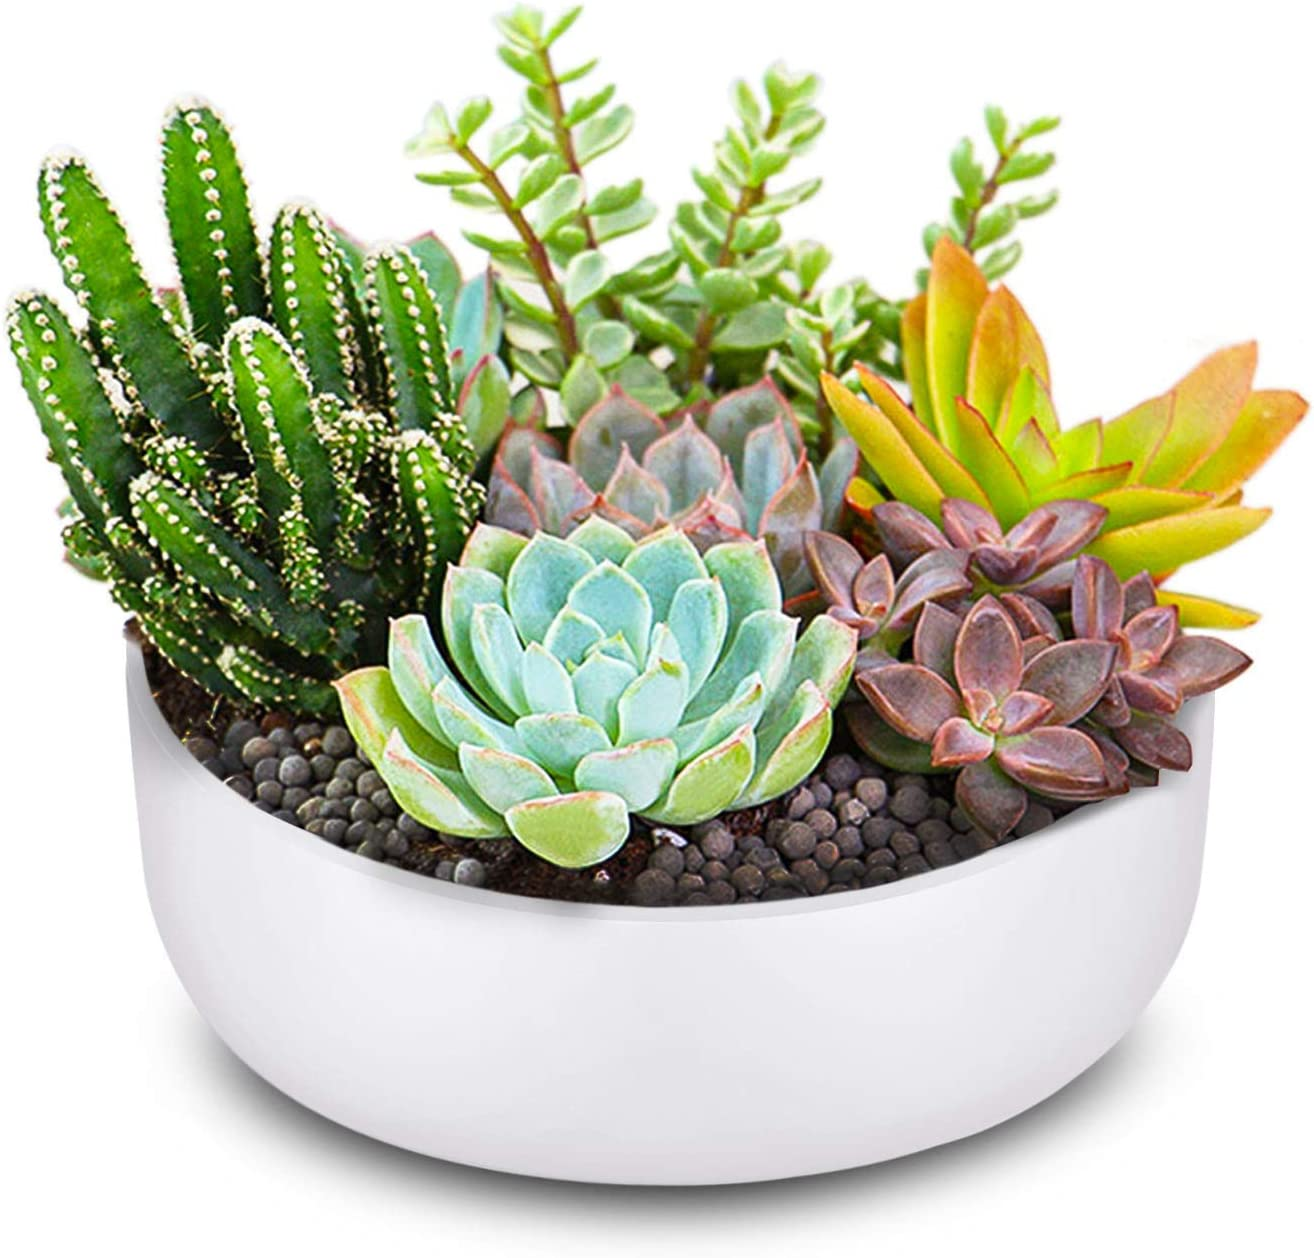 Flexzion 6 Inch Round Ceramic Succulent Planter Pot - Cactus Herb Flower Container Window Box Holder for Tabletop Desktop Indoor Outdoor Home Office Garden (White)